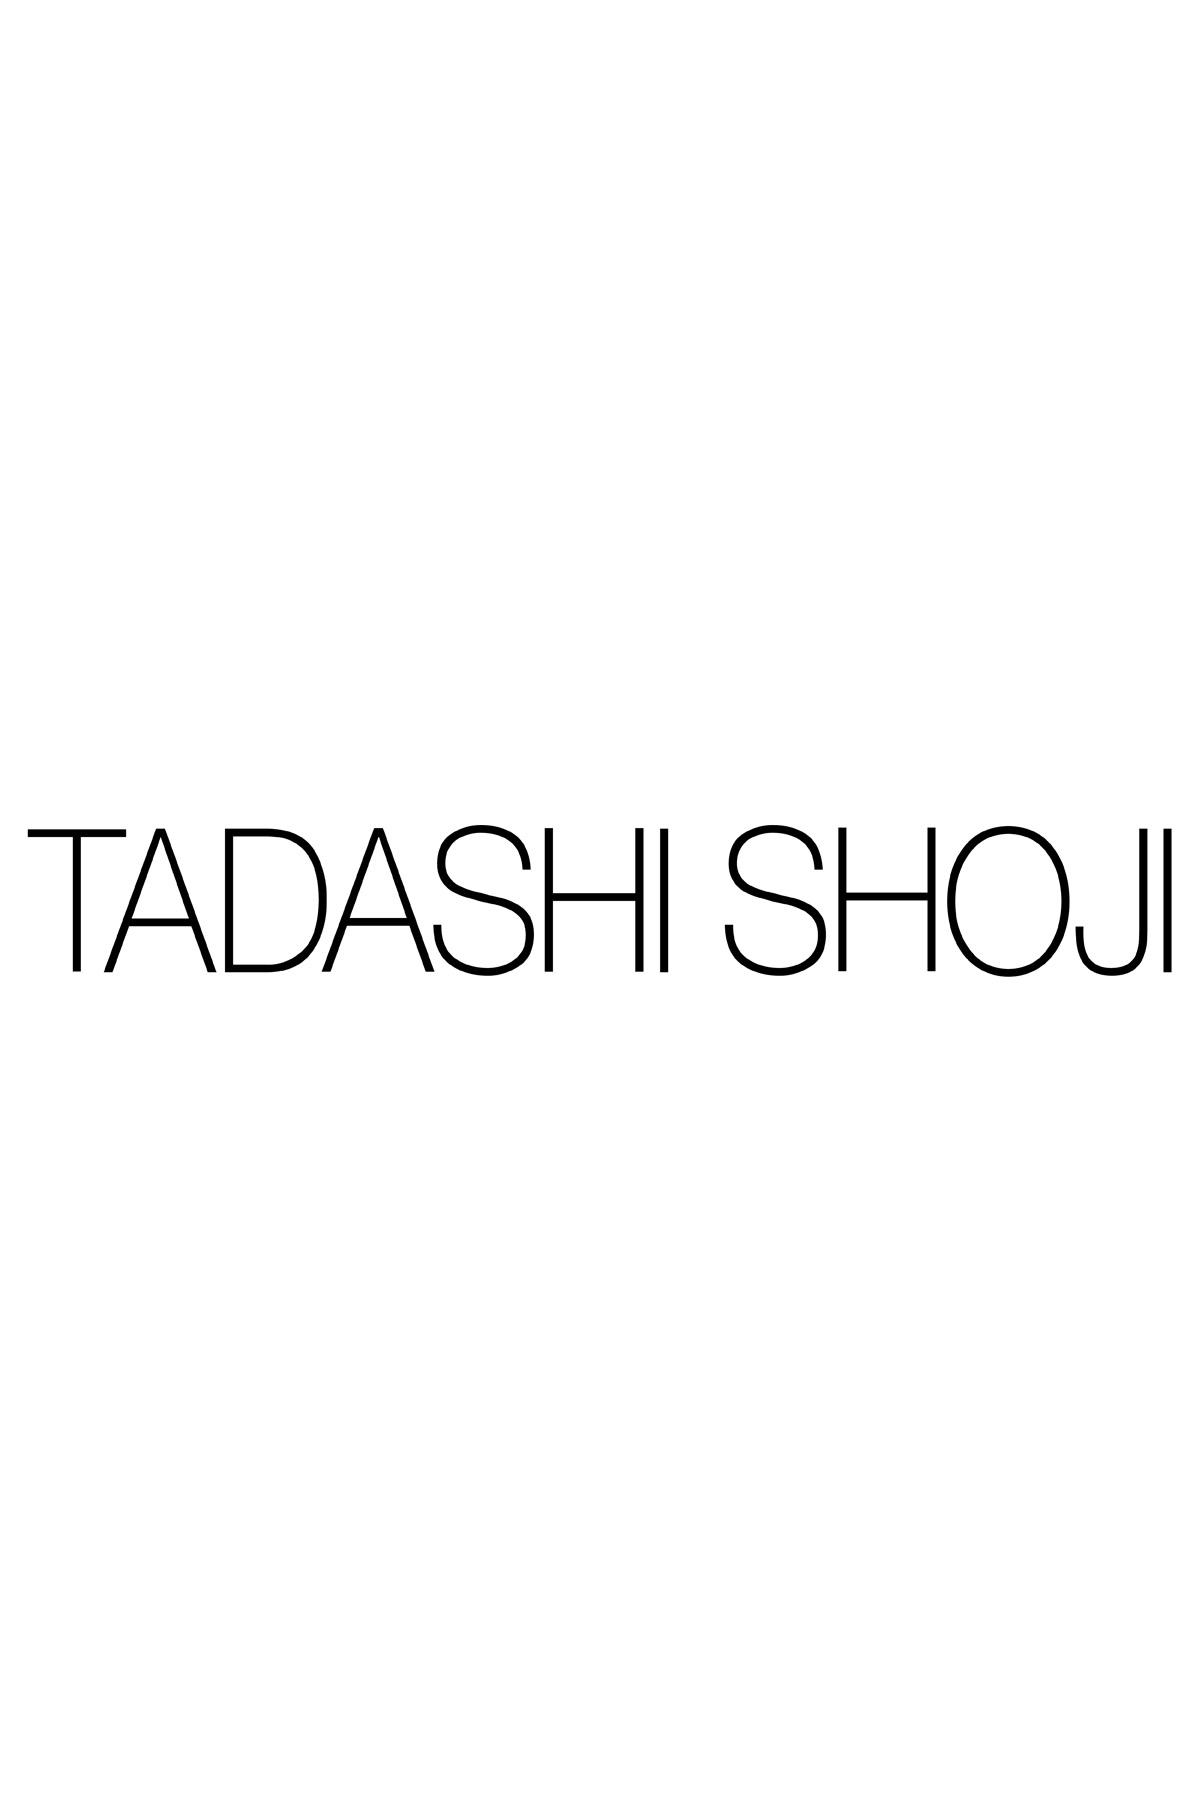 Tadashi Shoji - Clotide Dress